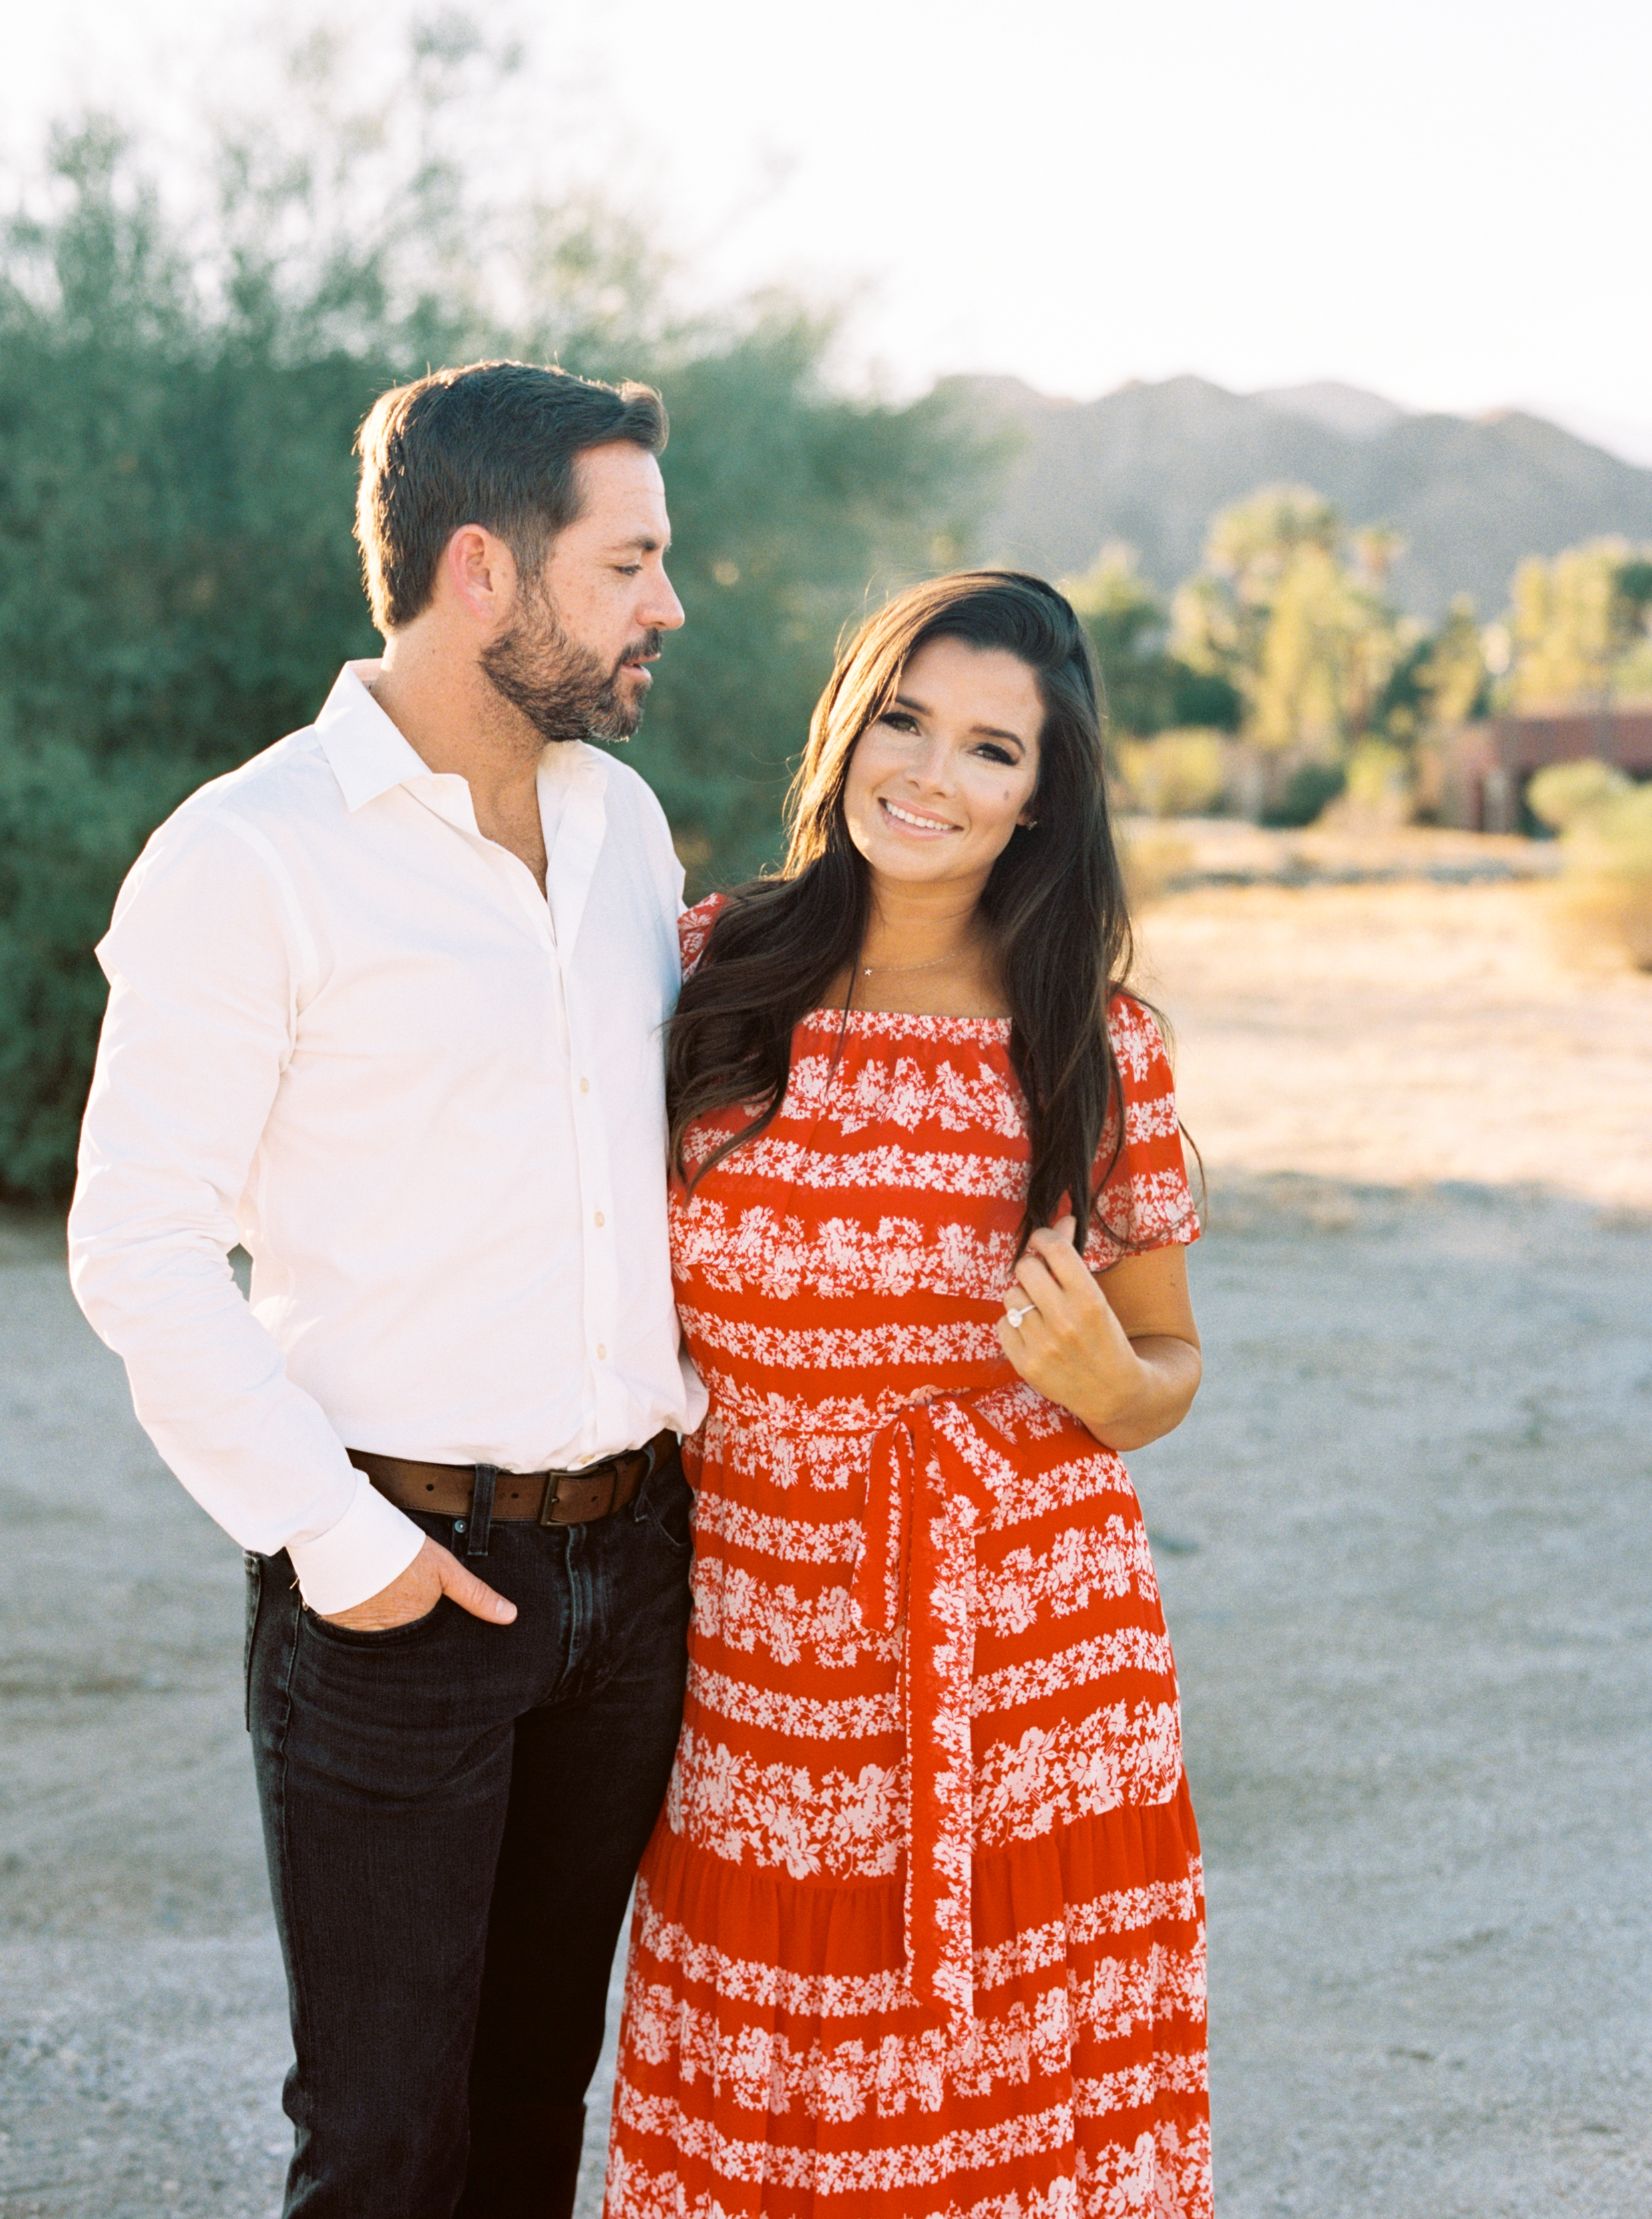 Palm Sprinsg Wedding Photographer Jenny Losee (17 of 32).jpg